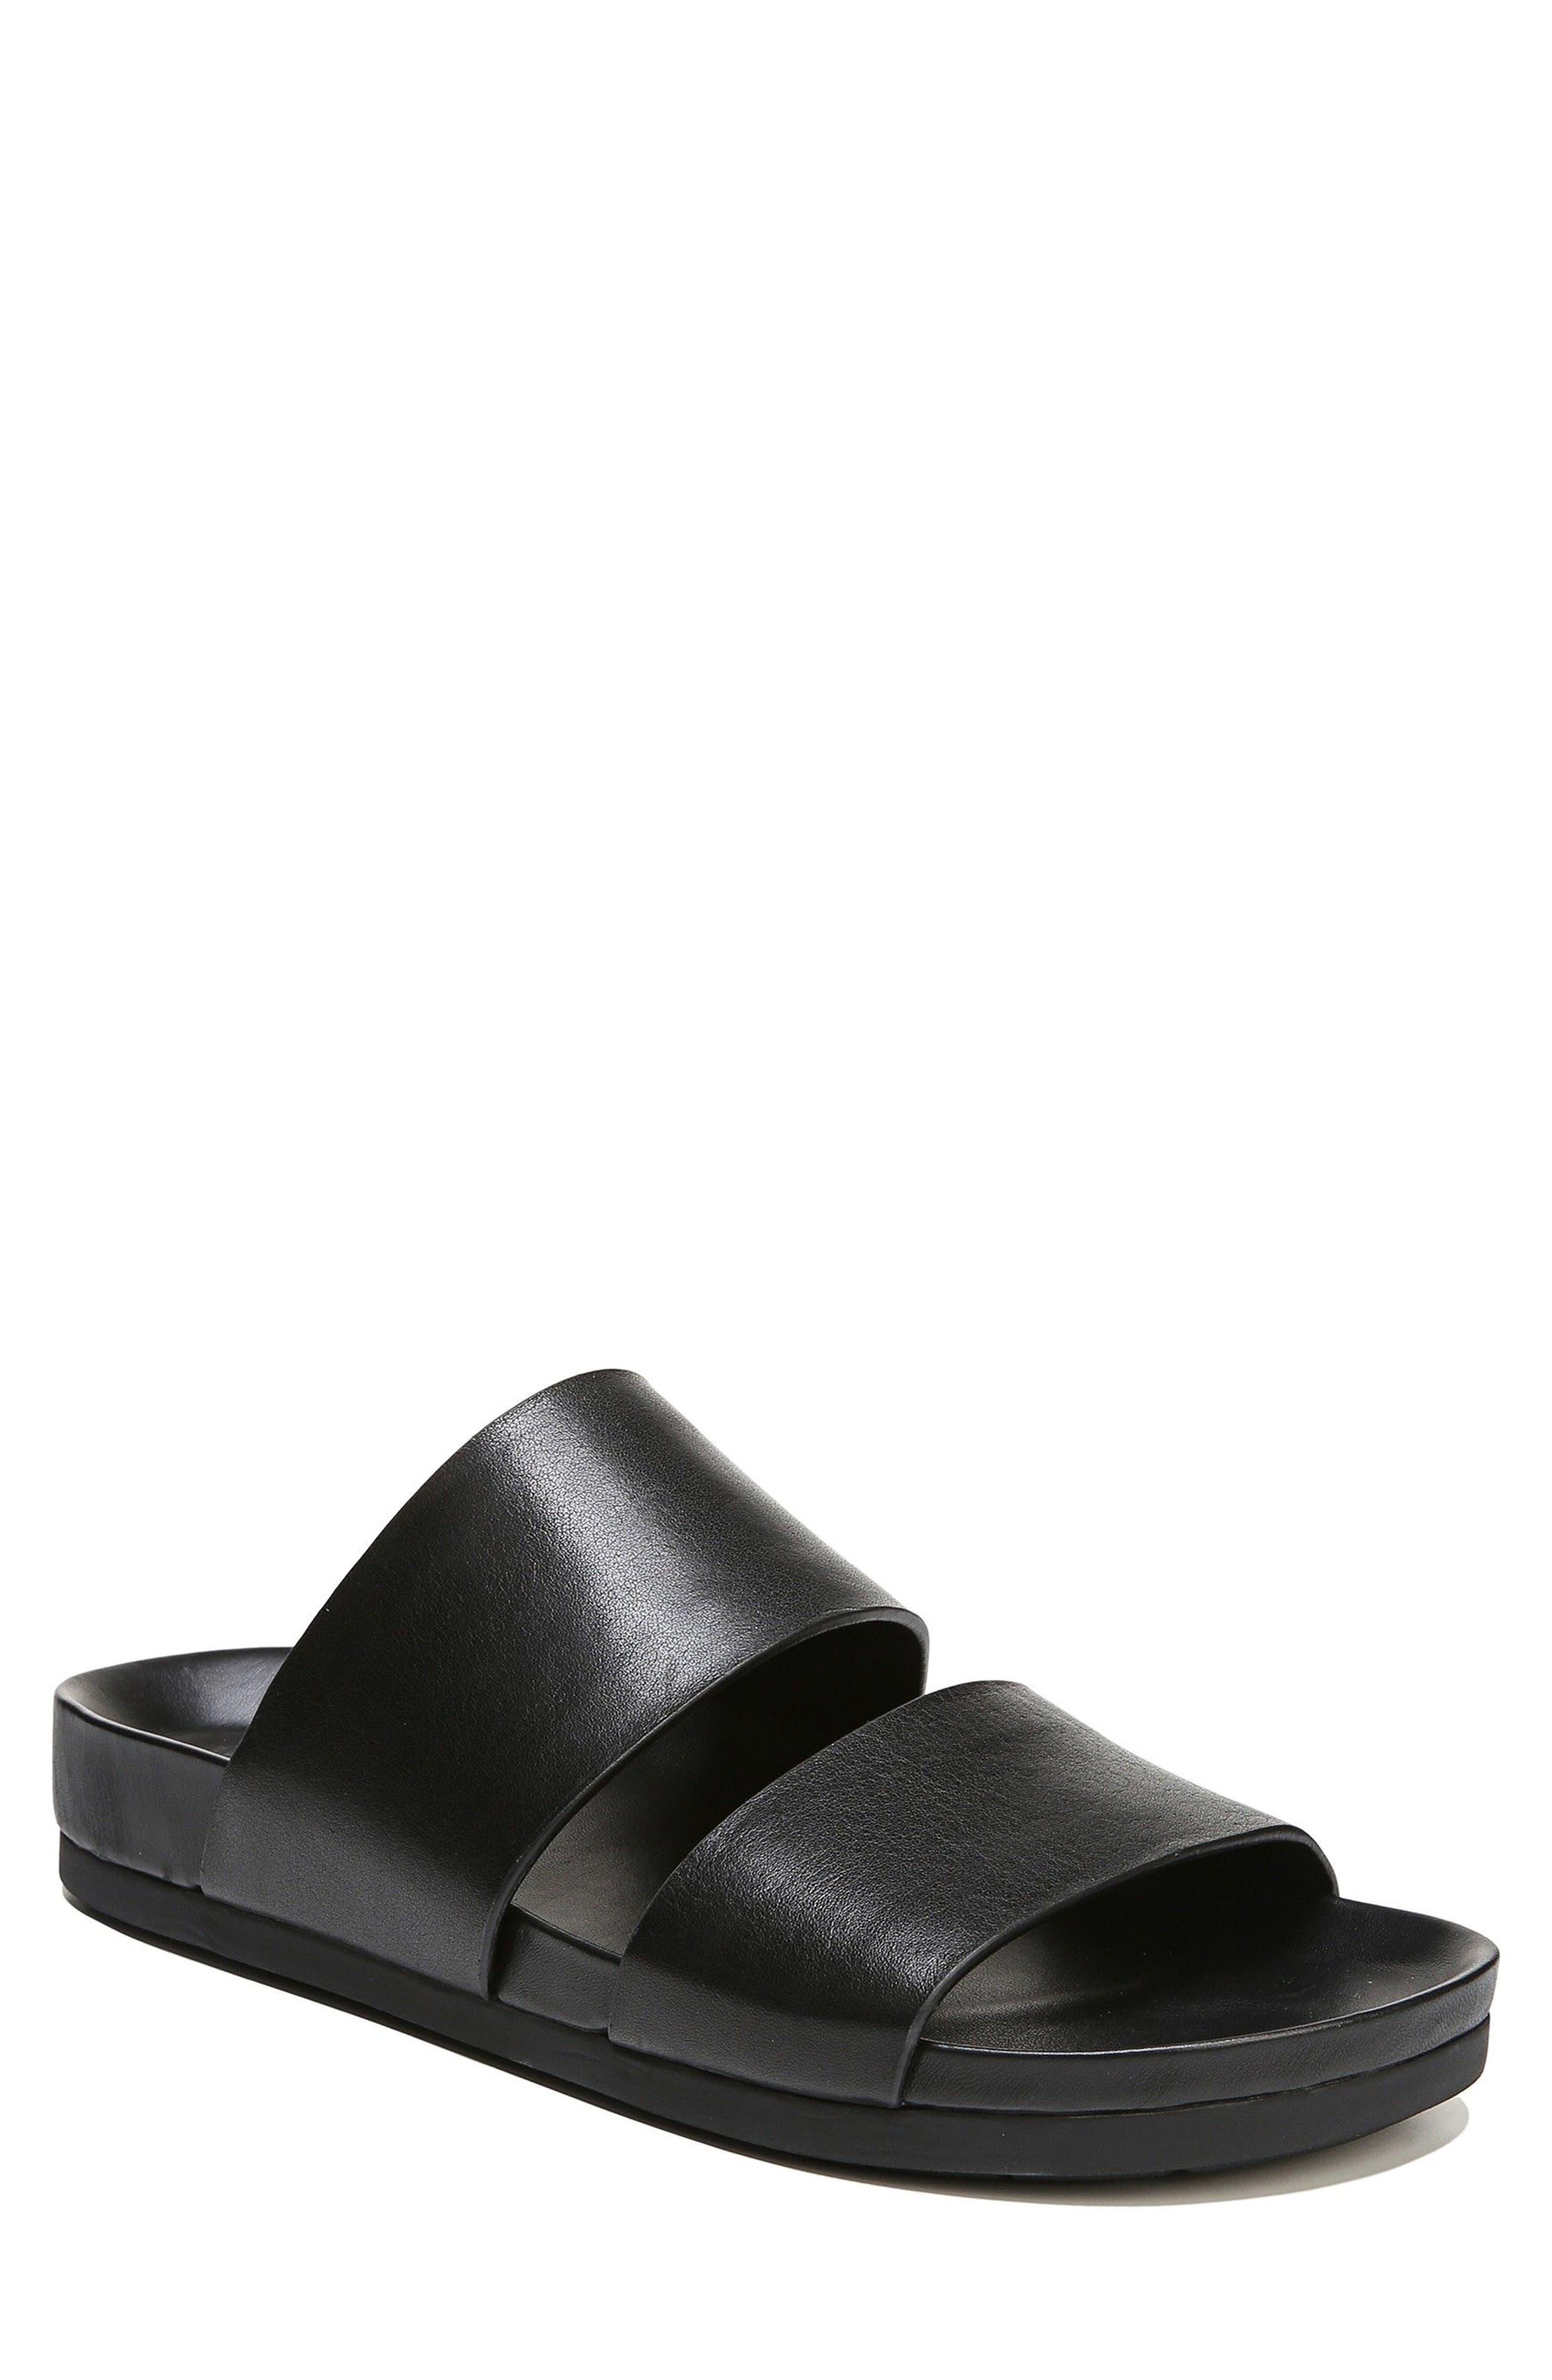 Malibu Slide Sandal,                         Main,                         color, Black